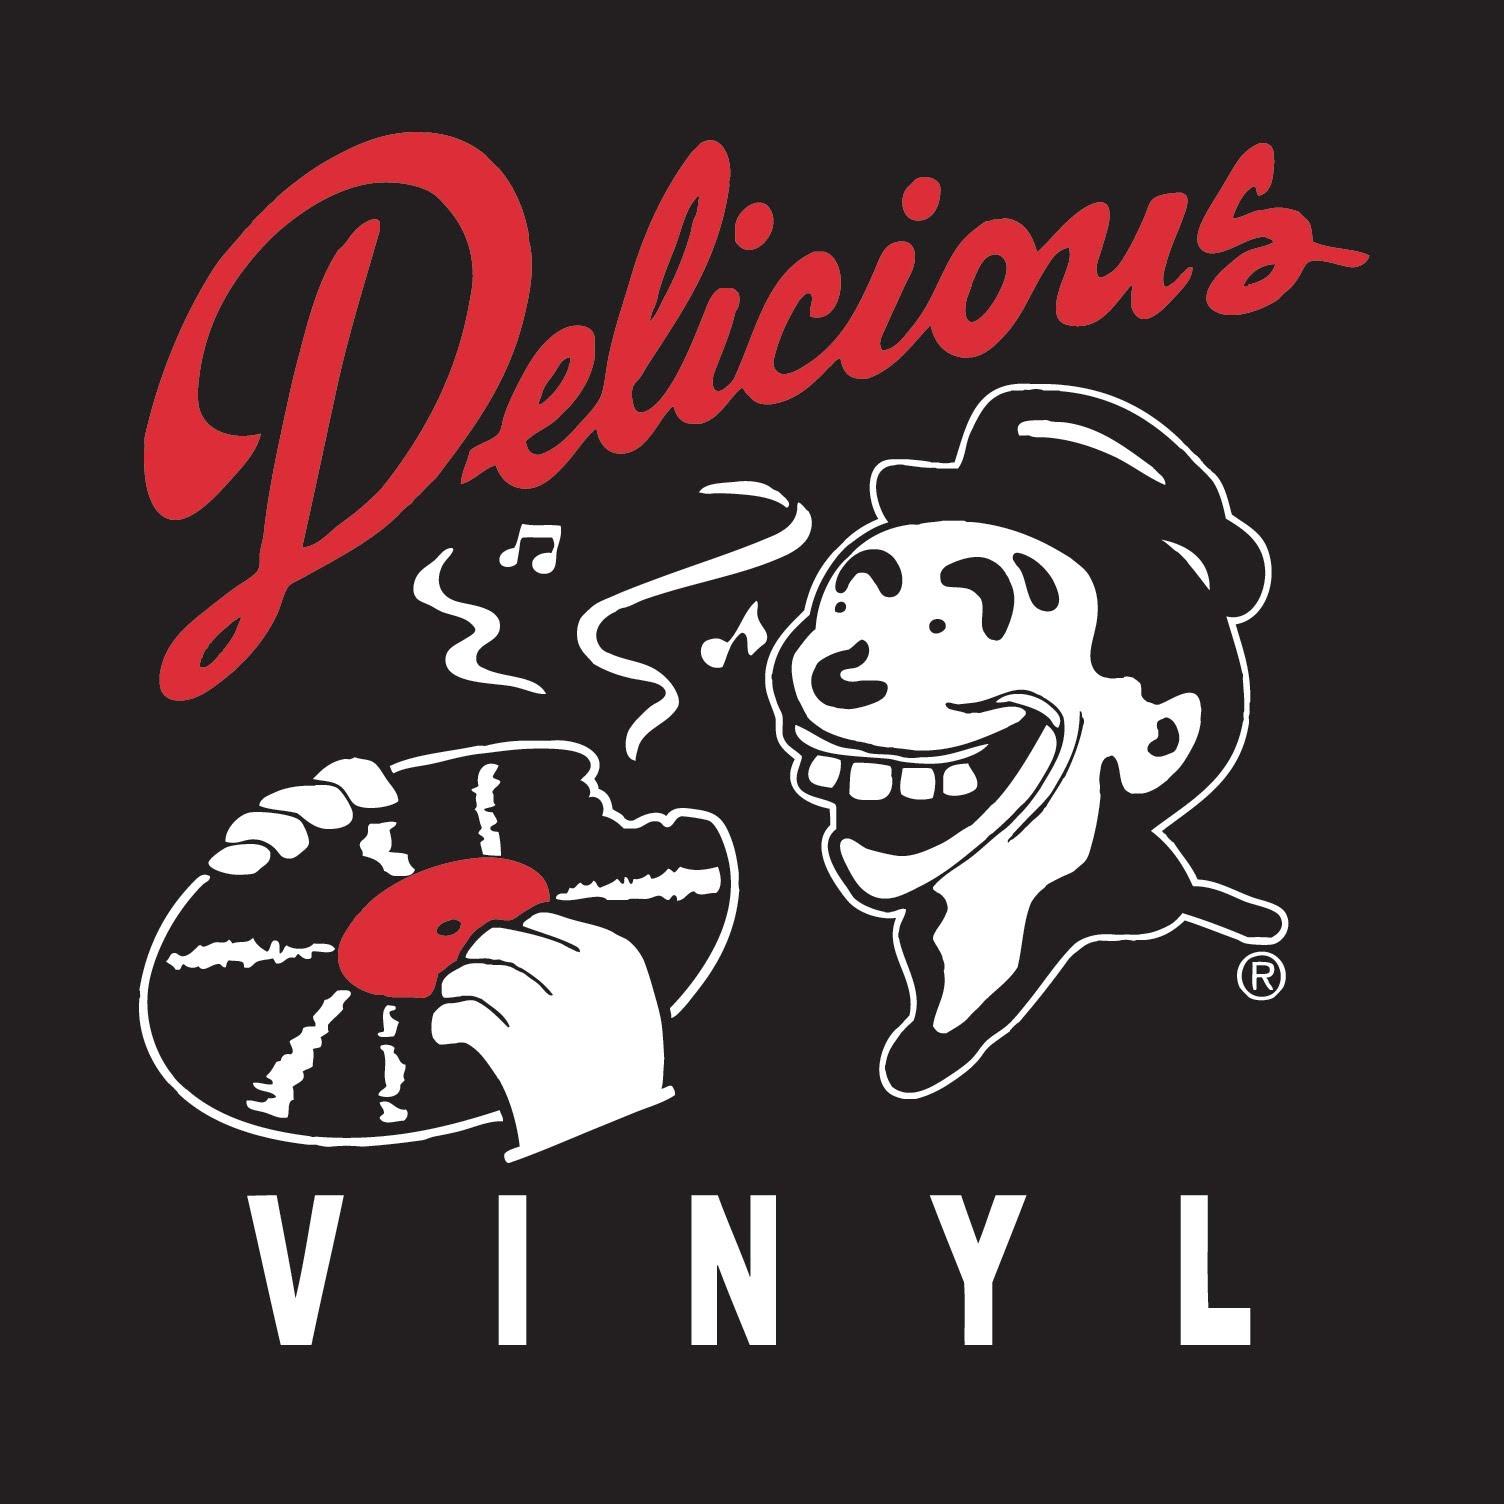 Delicious Vinyl Hip Hop Wiki Fandom Powered By Wikia